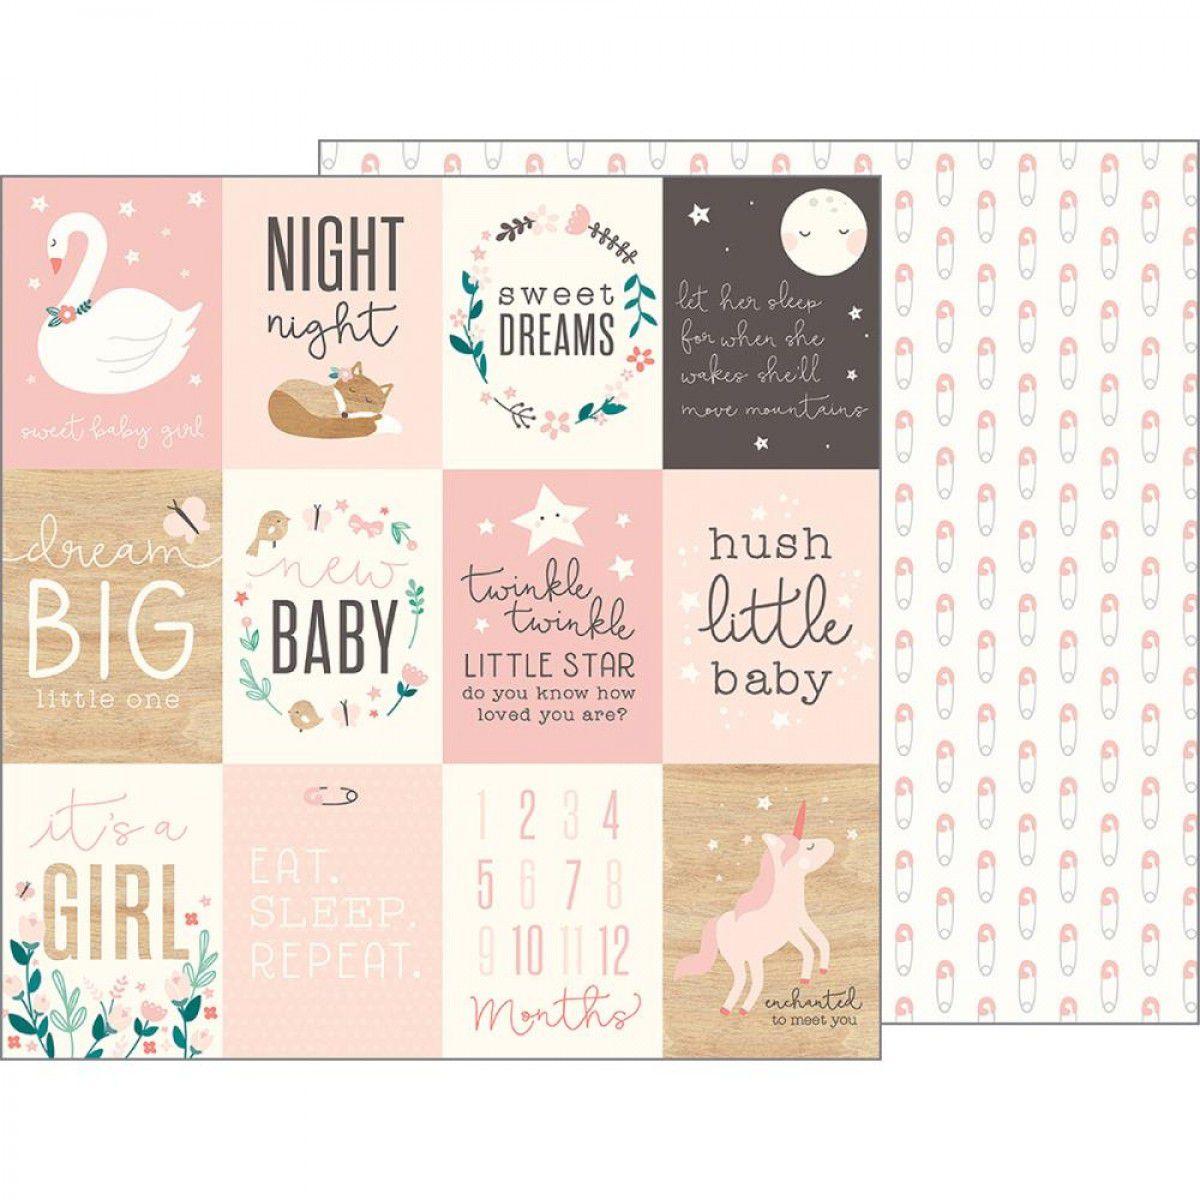 732645 - NIGHT NIGHT - SWEET BABY GIRL - PEBBLES